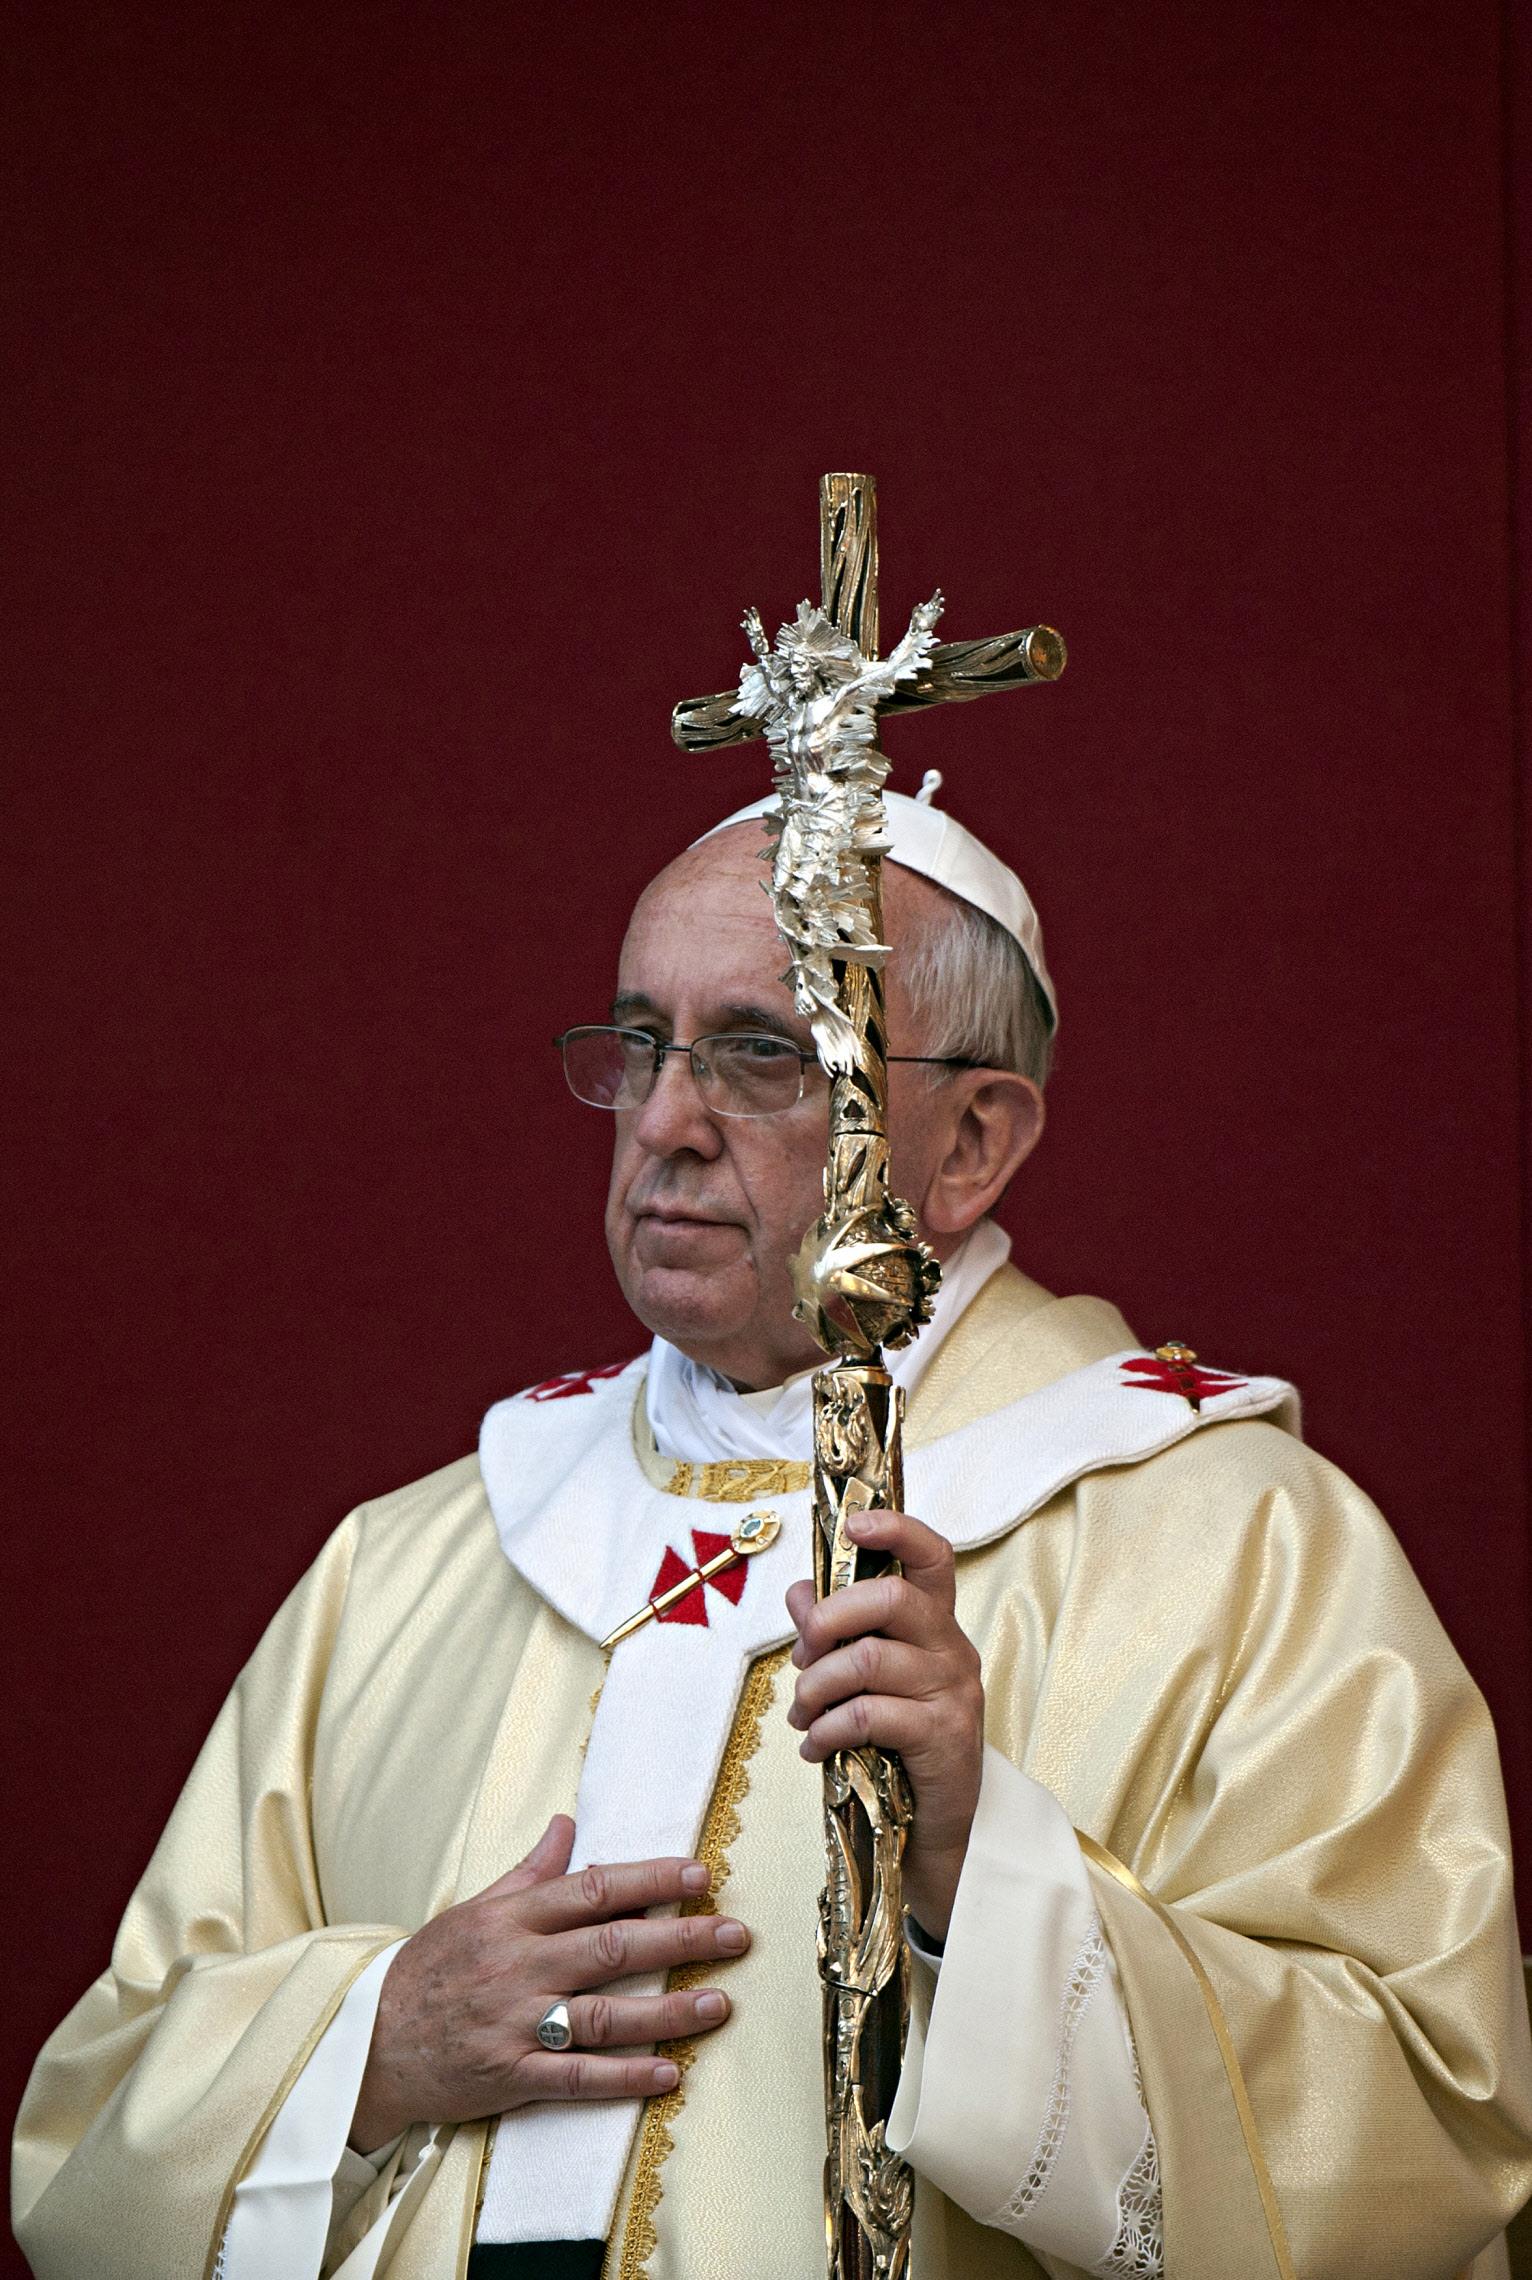 POPE FERULA